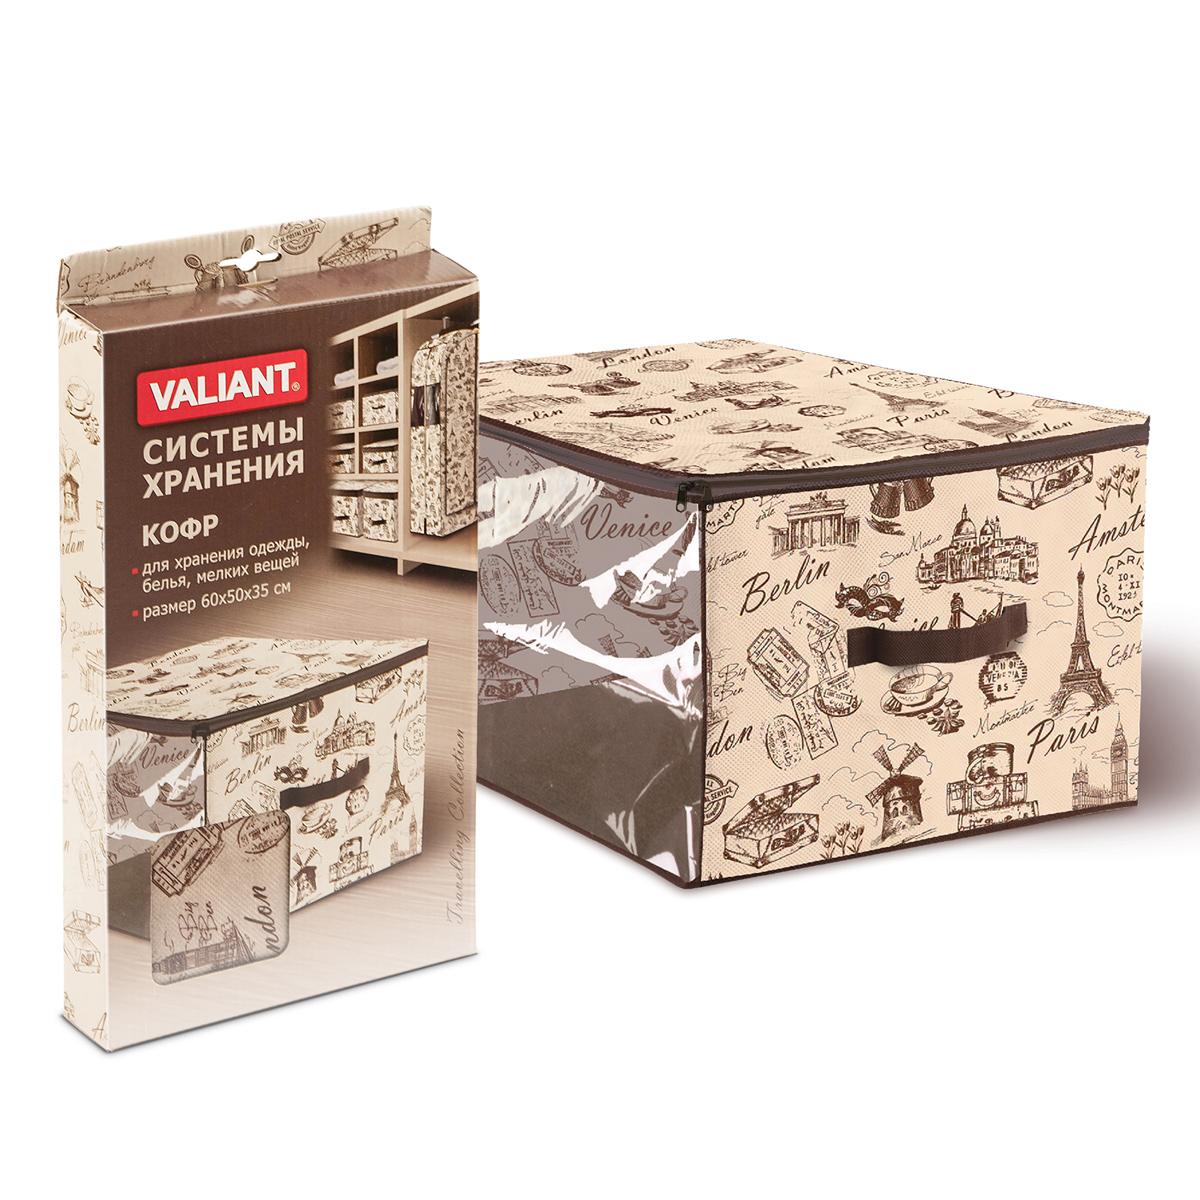 Кофр для хранения Valiant Travelling, 60 см х 50 см х 35 см кофр для хранения valiant romantic 60 х 50 х 35 см